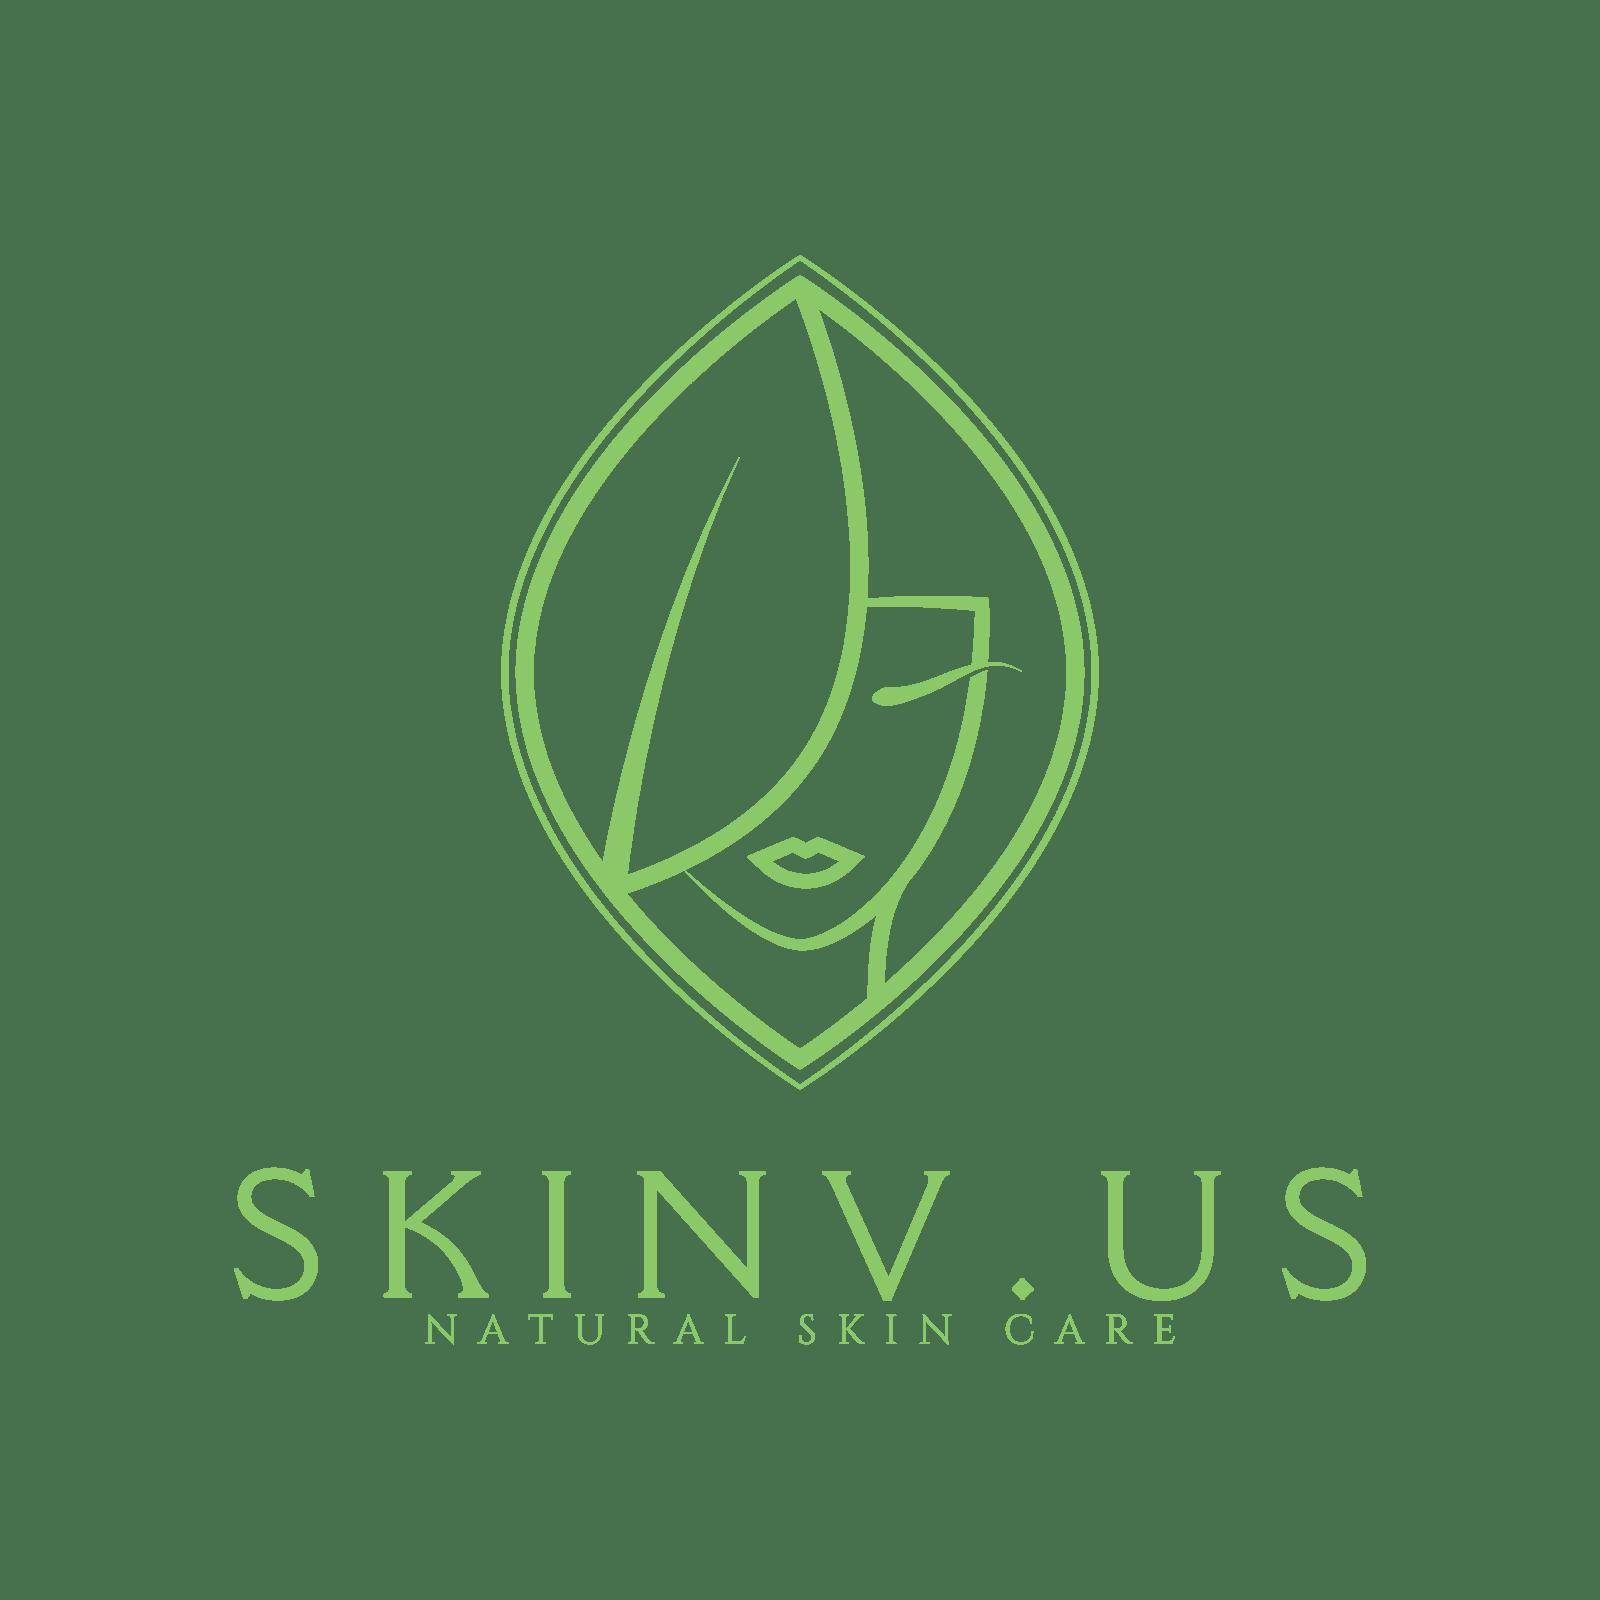 Skinv.us